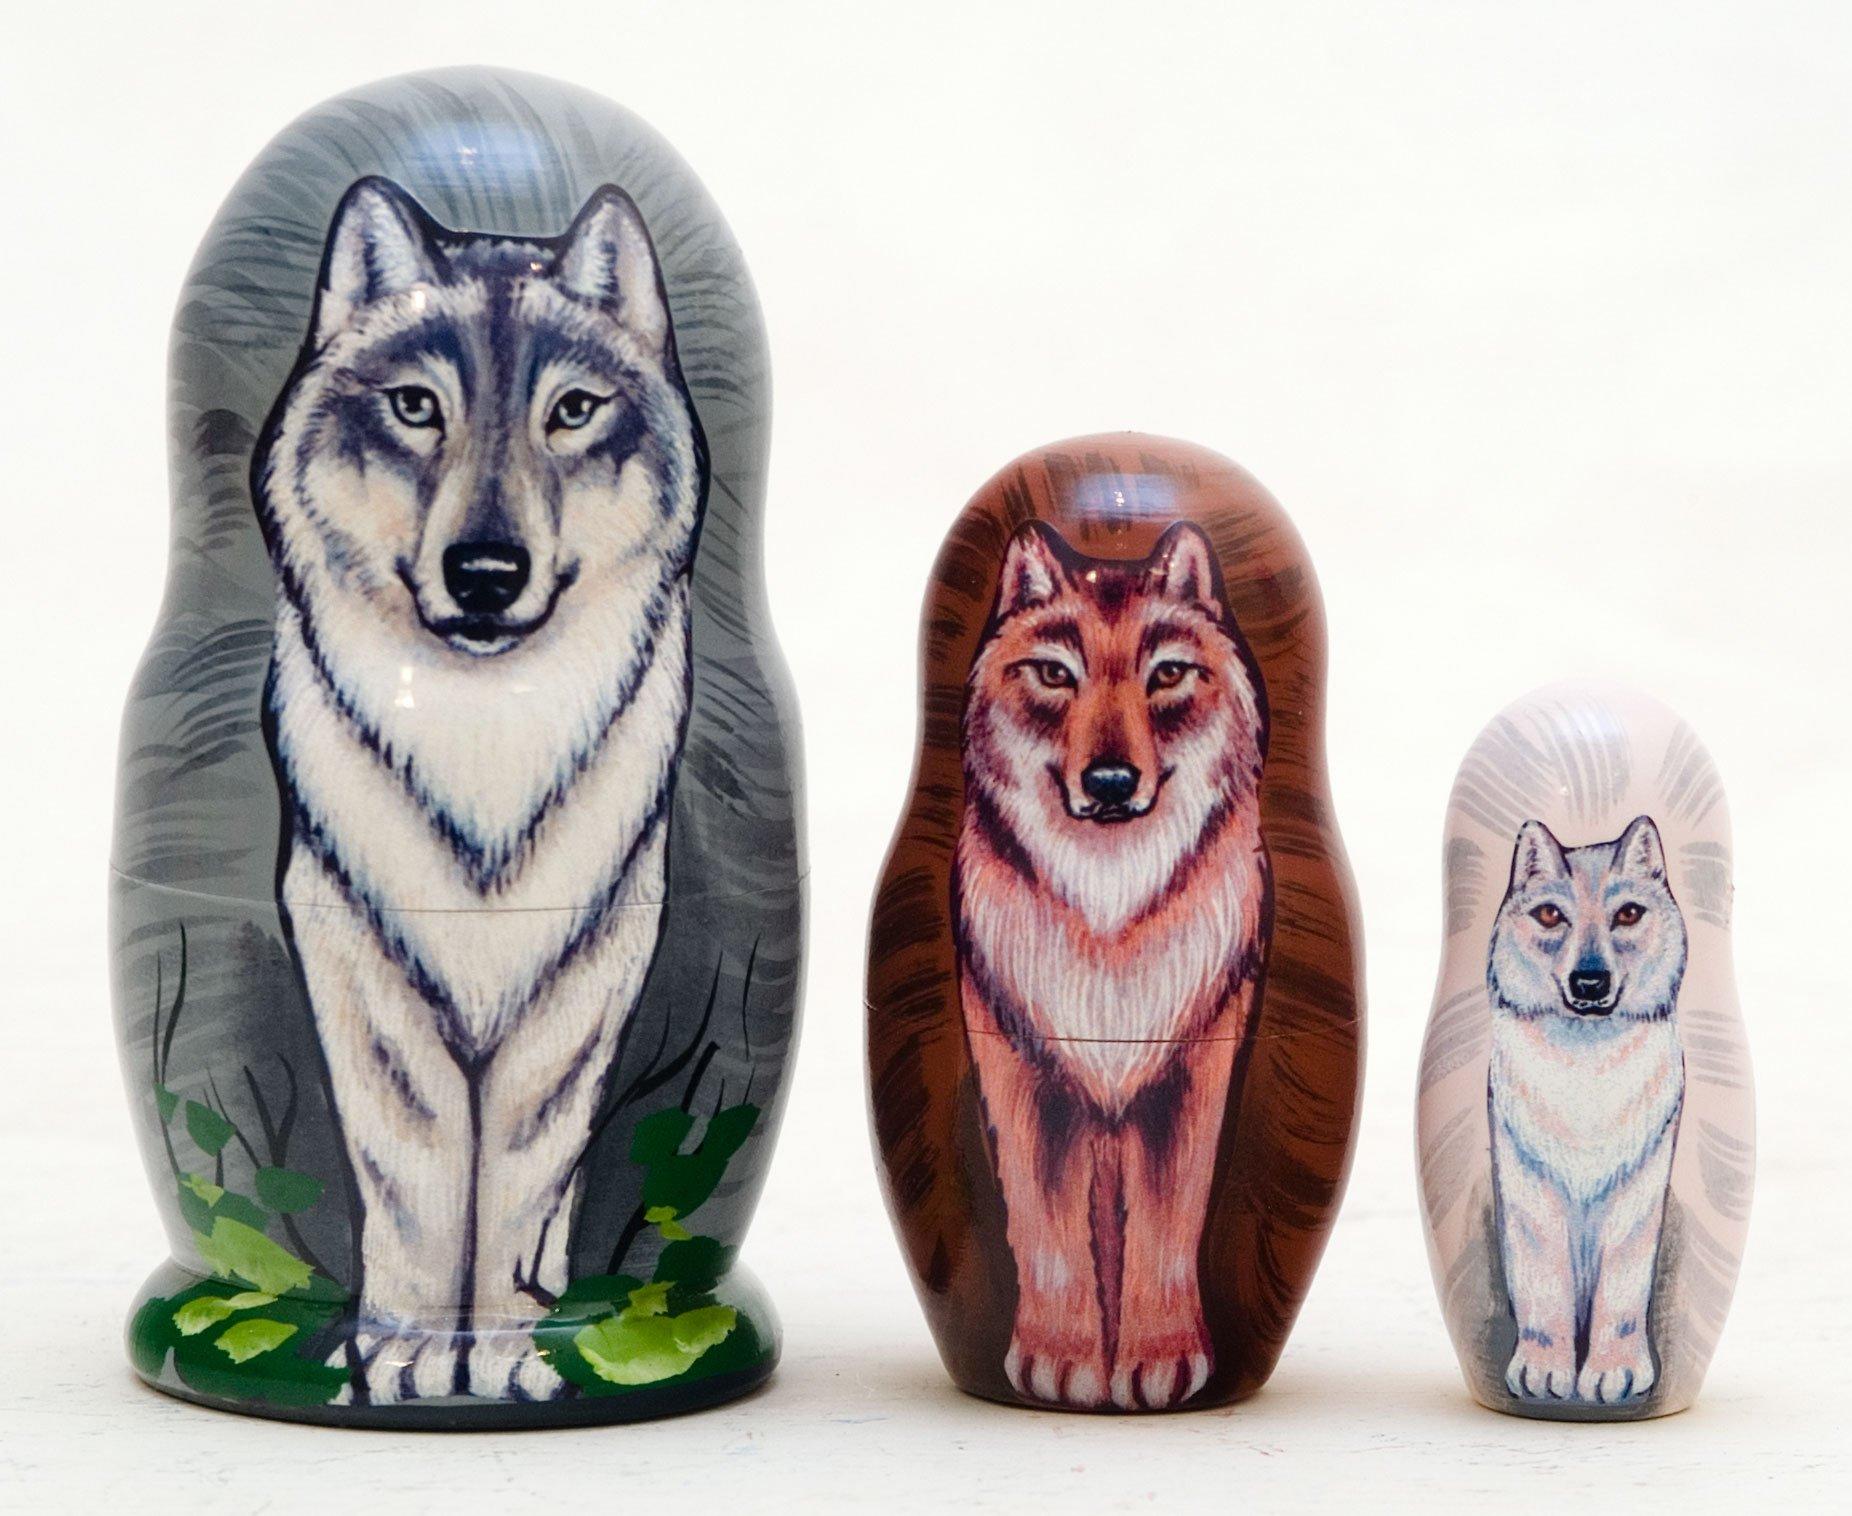 Made in Russia Wolf Pack Nesting Doll 3pc./3'' aka Grey Wolf or Timber Wolf Matryoshka Collectible Babushka Russian Doll top quality 100% Guaranteed!